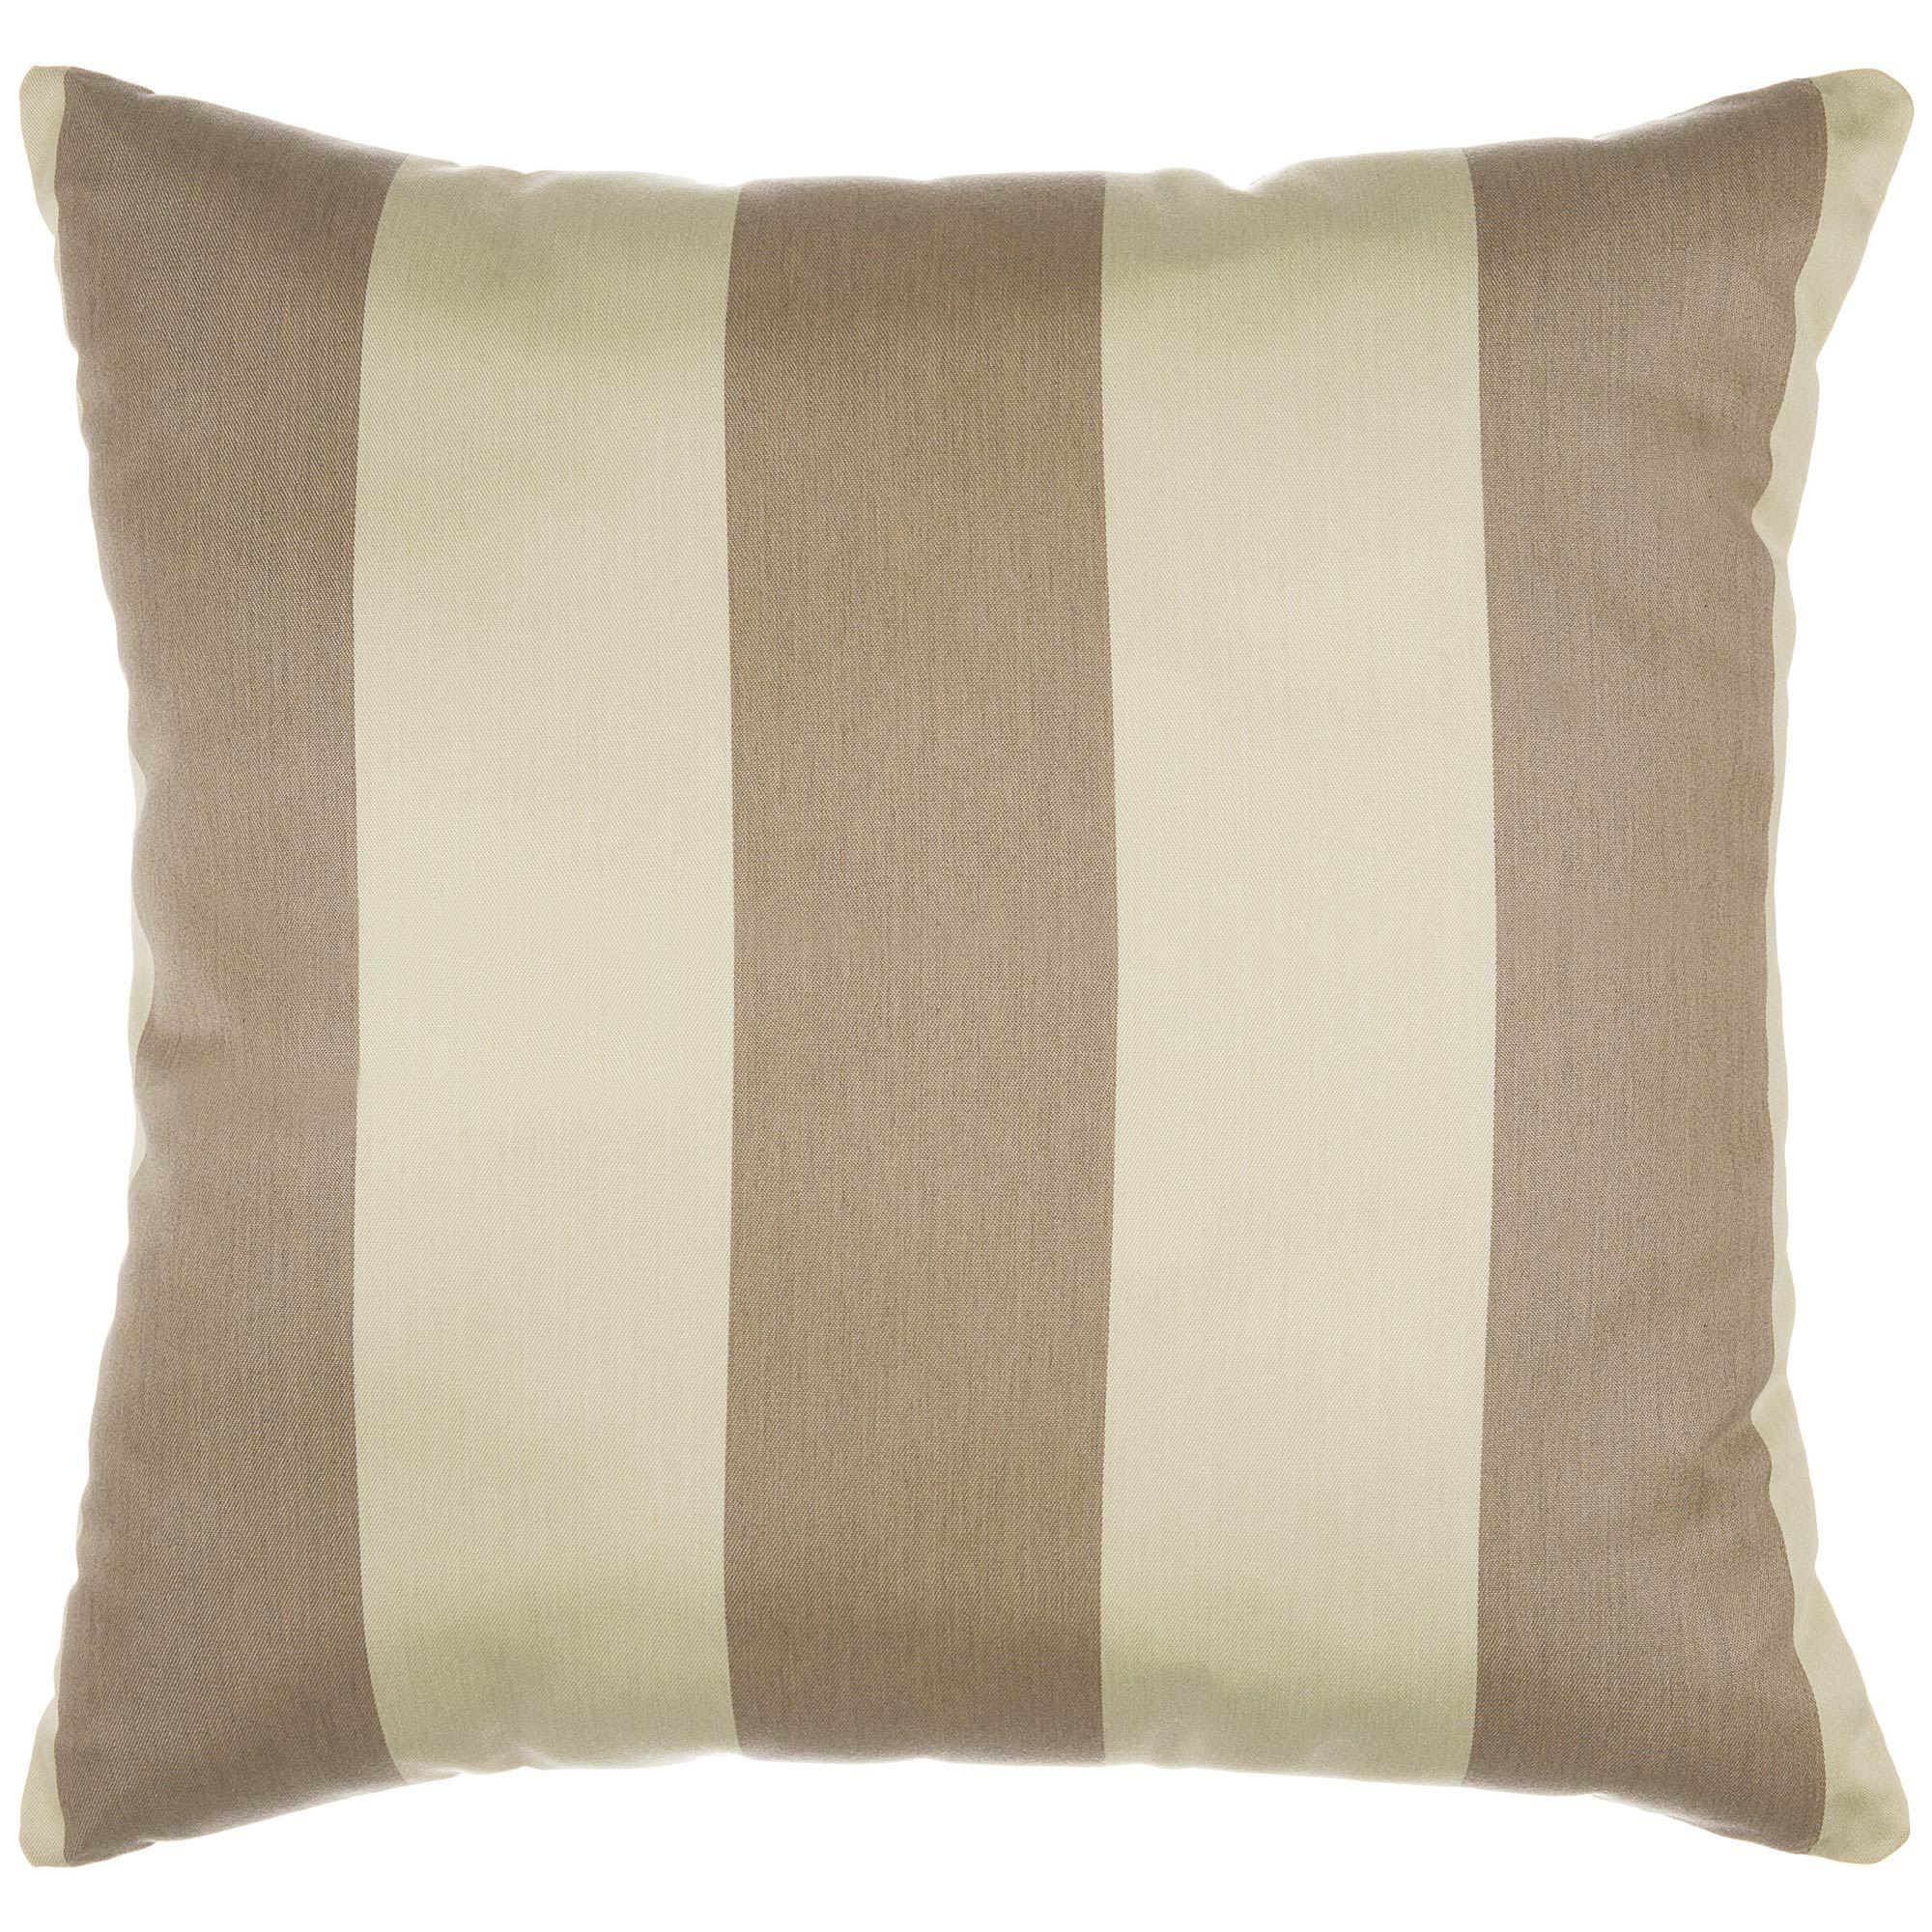 Regency Sand Sunbrella Outdoor Pillow on Sale  PIBSQRS